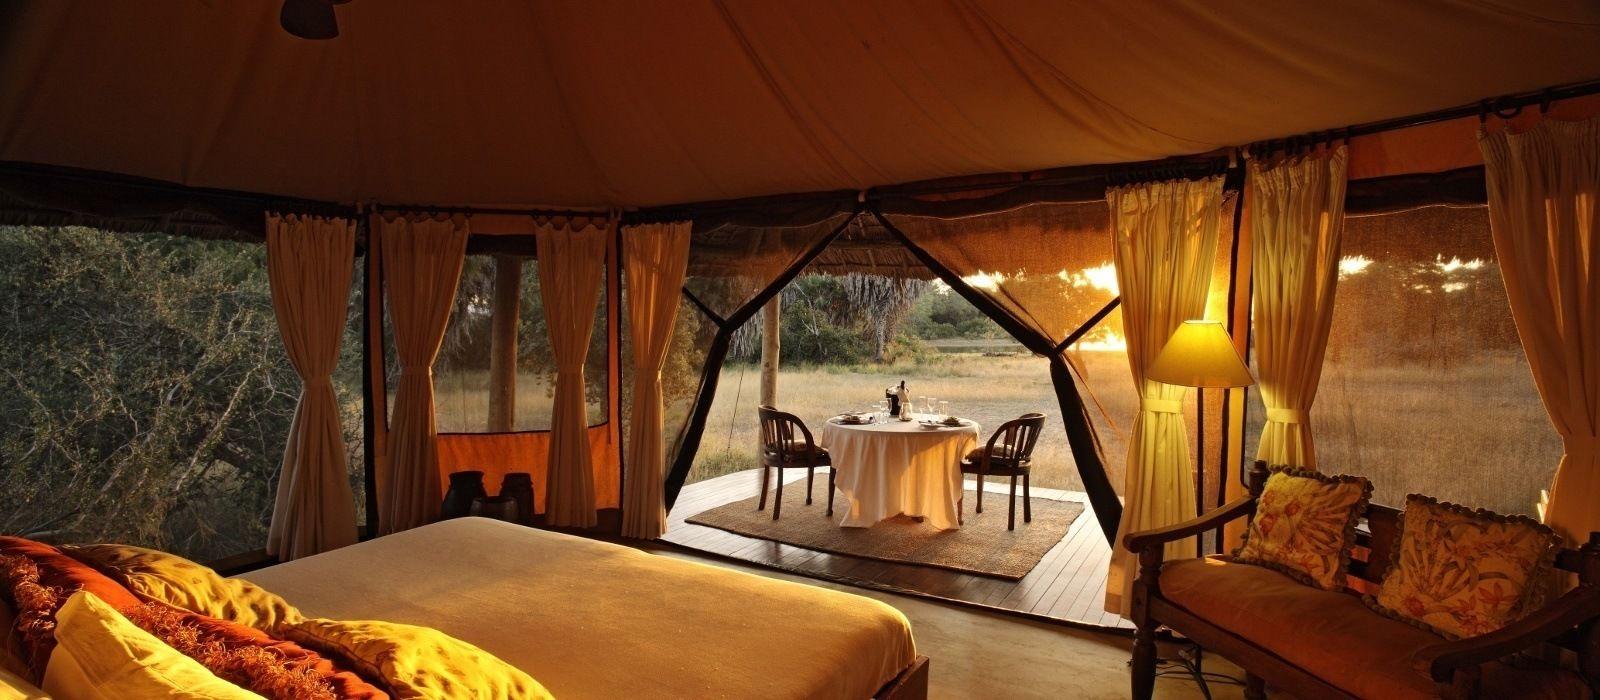 Tansania: Wahre Wildnis, unberührtes Juwel & Inselparadies Urlaub 8